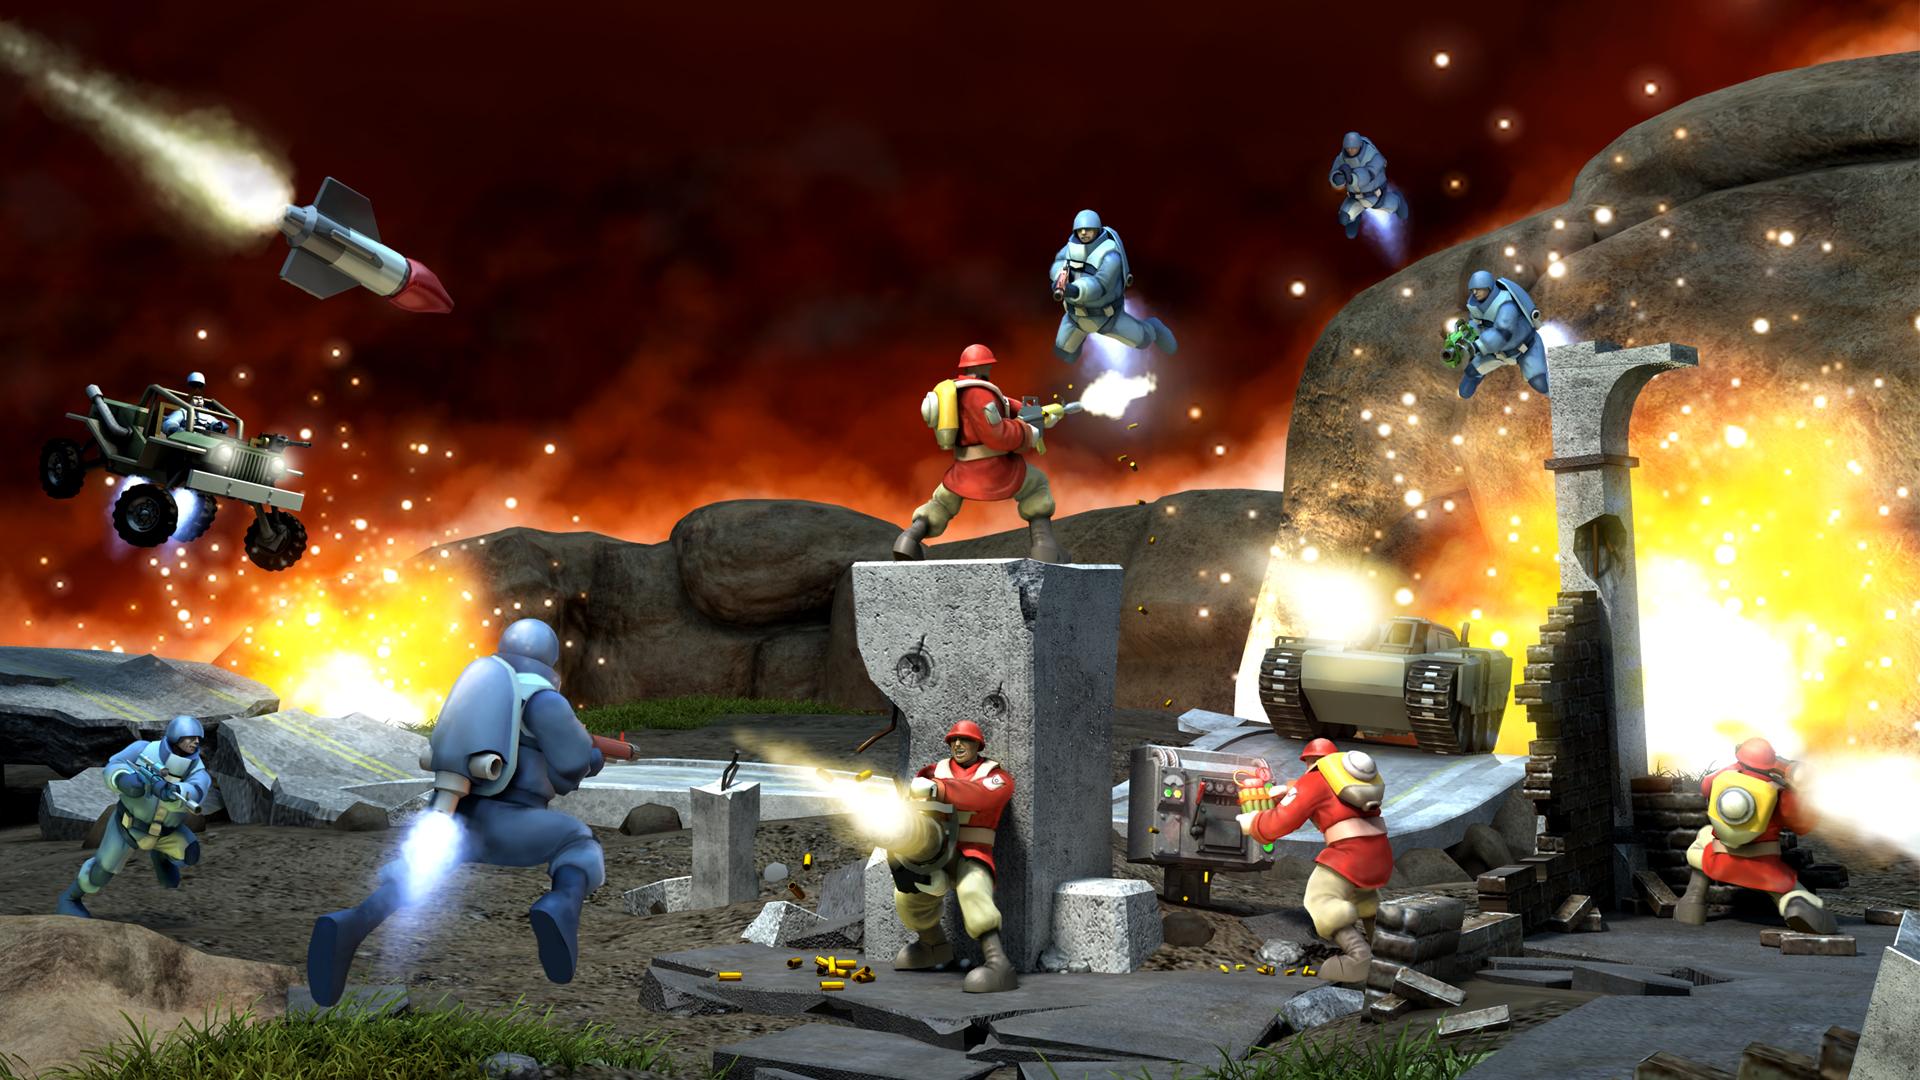 PSN Games-DLC-PSone-miniS-Demos-Huge Collection Of Links(3544 Raps